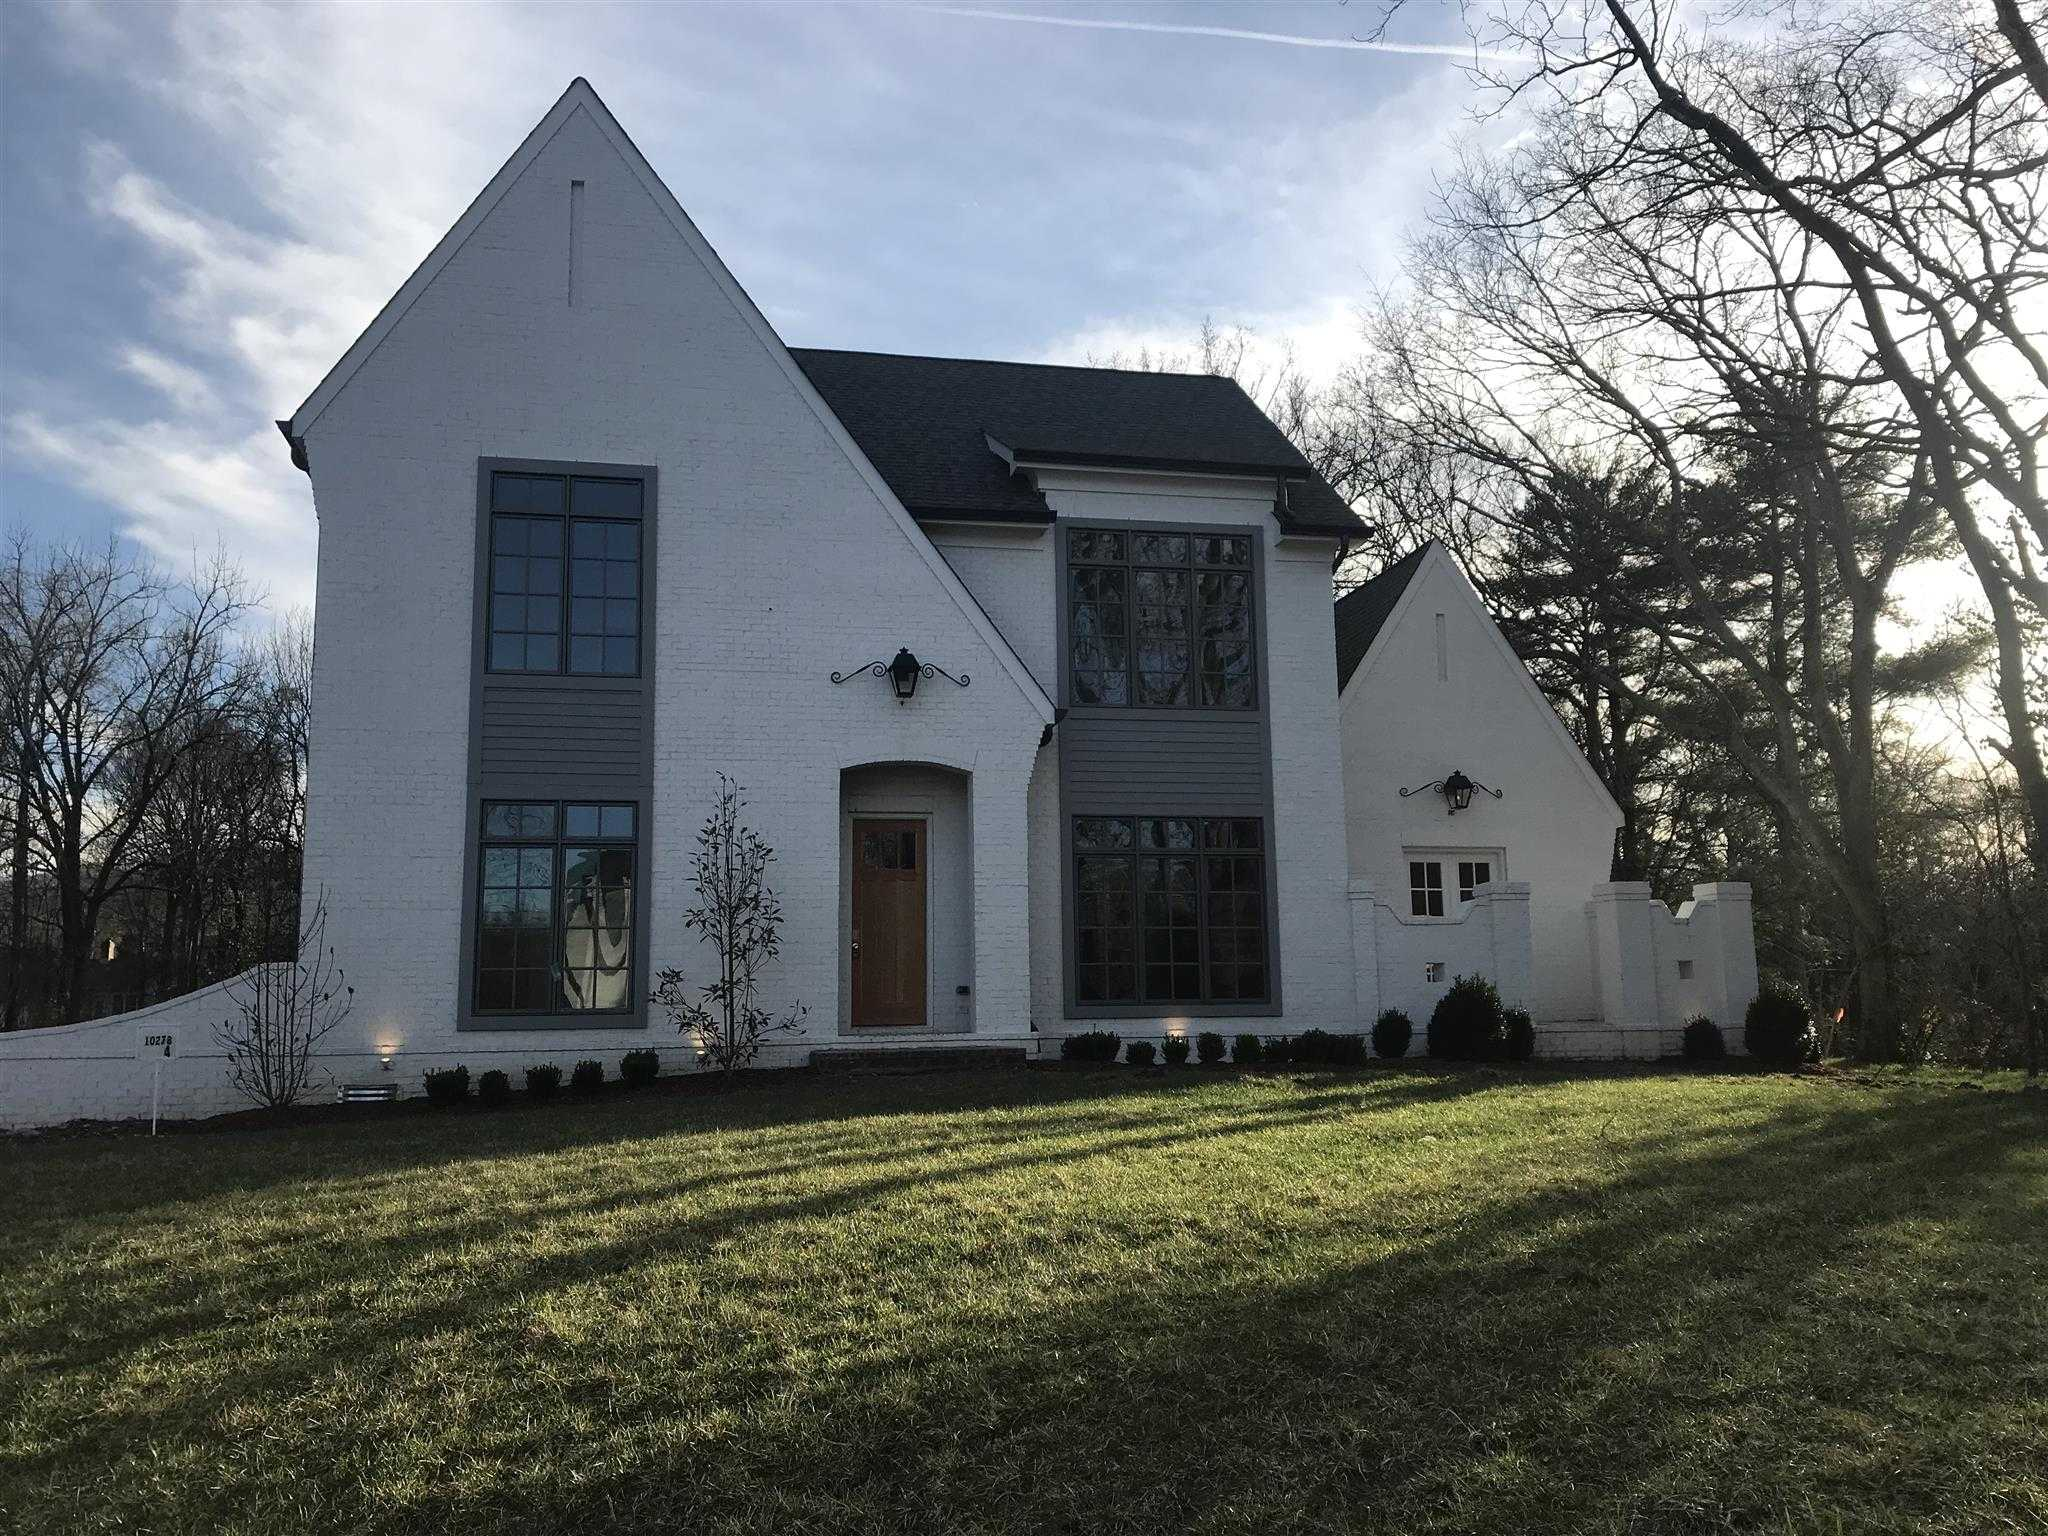 $2,350,000 - 4Br/6Ba -  for Sale in Battery Cove, Nashville